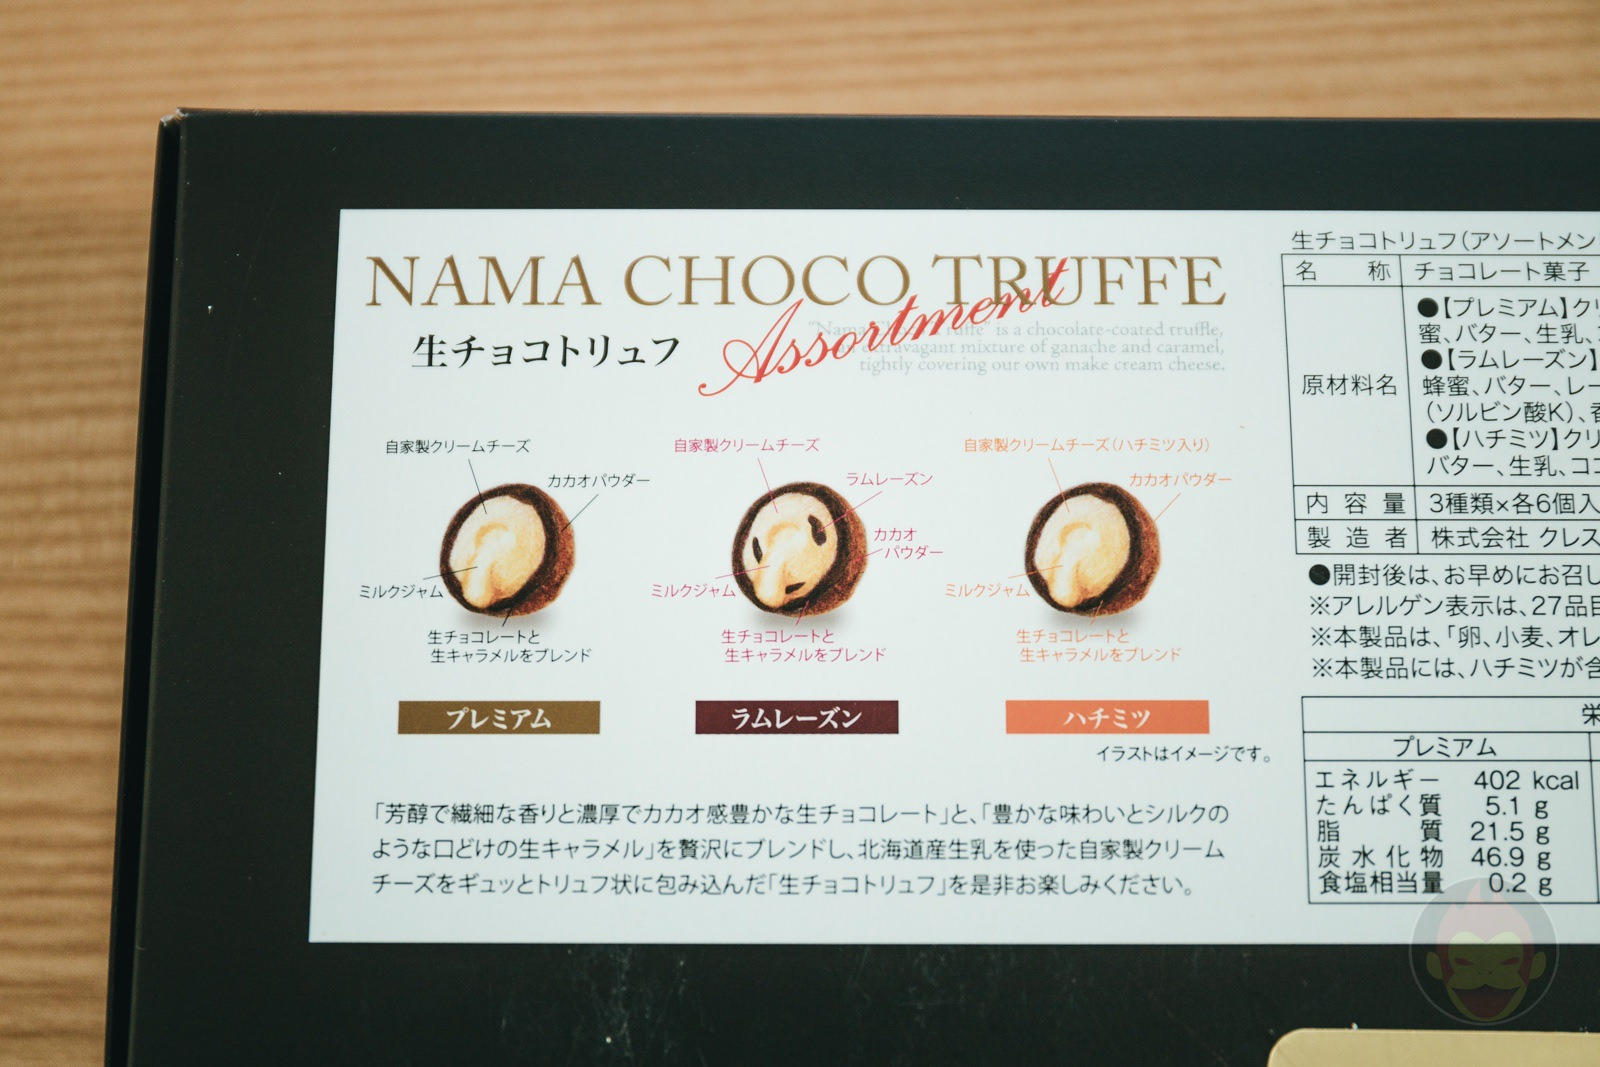 Nama Choco Truffe Costco 06